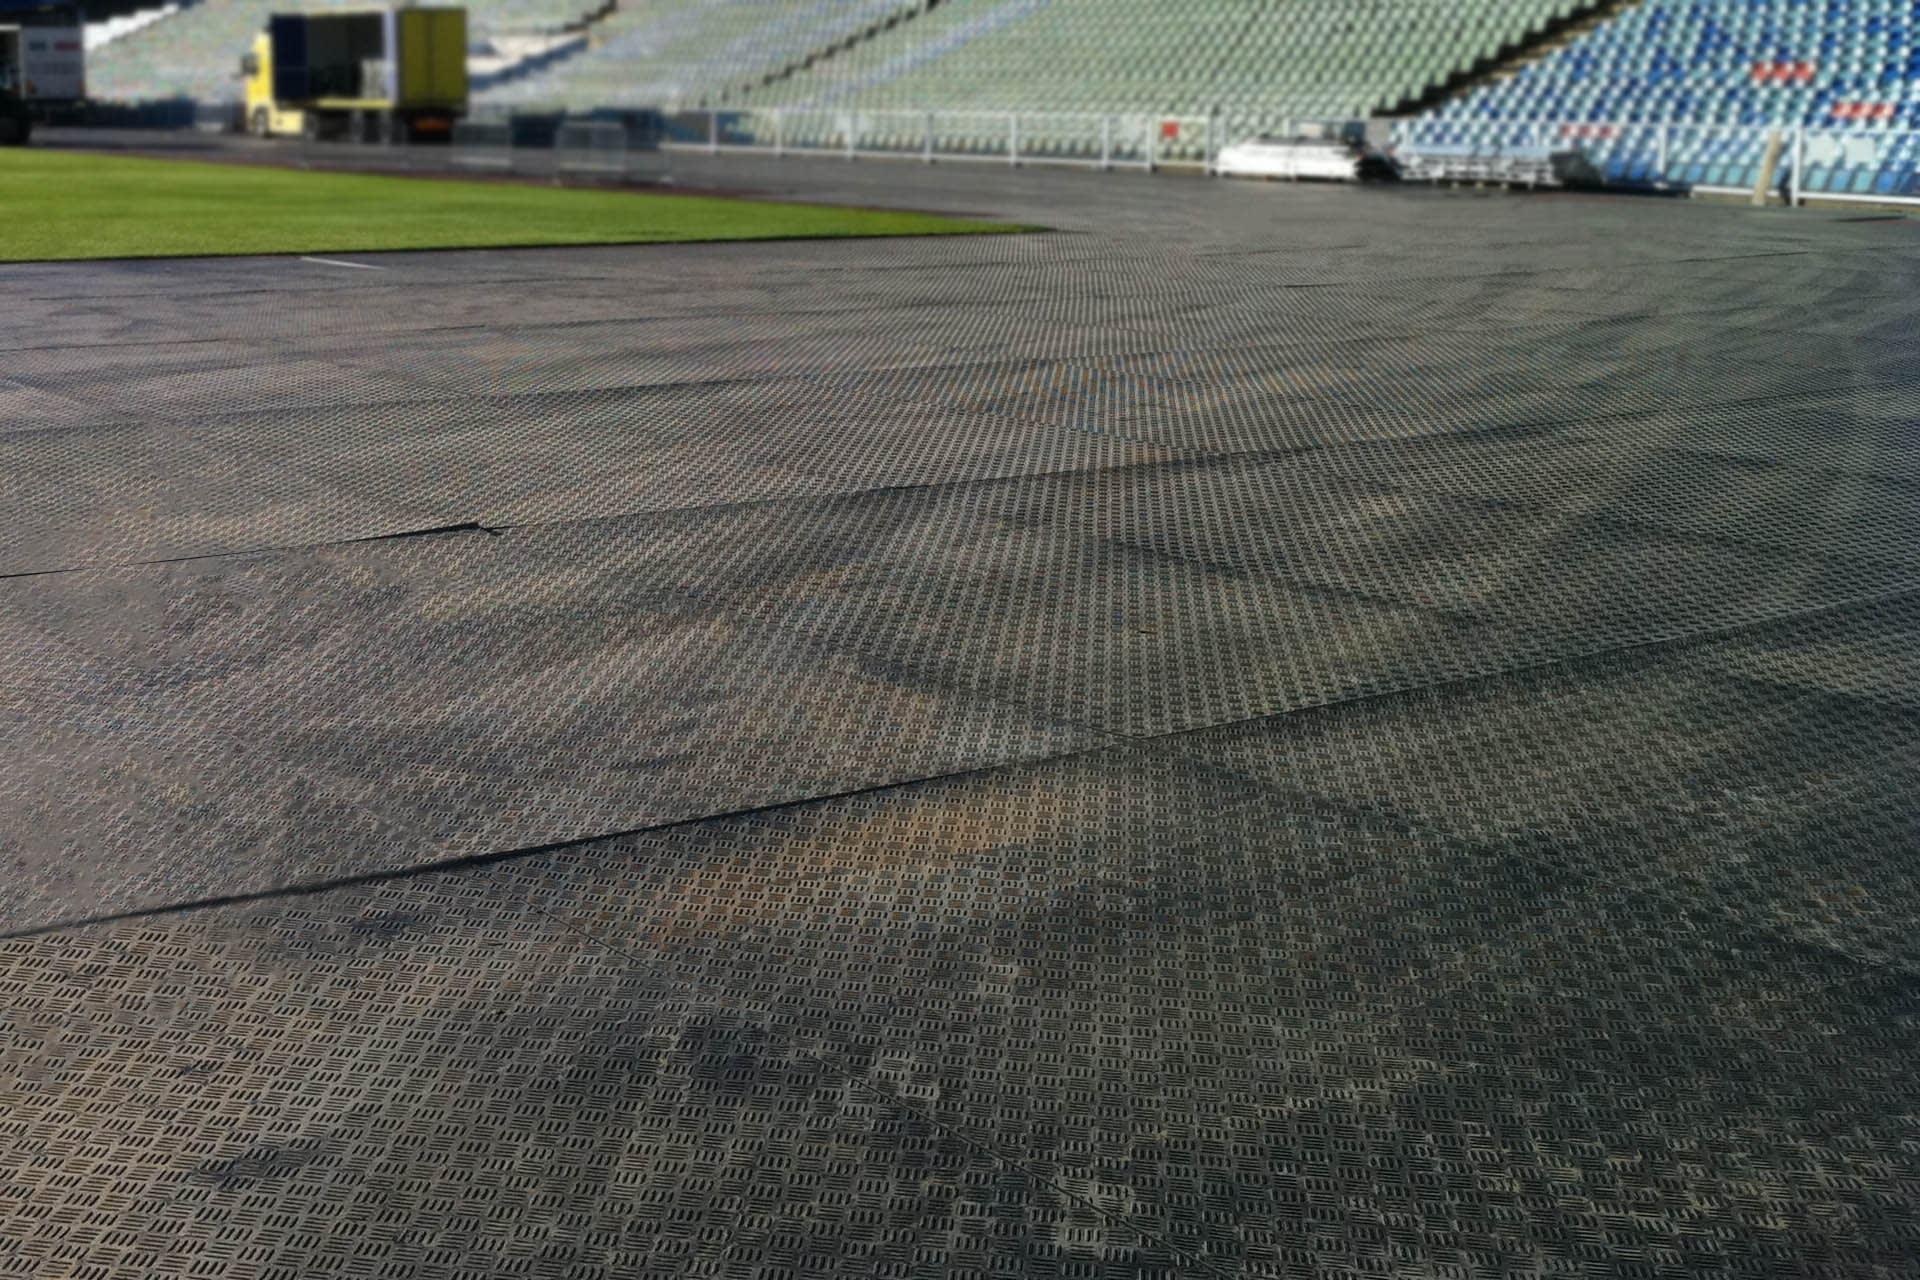 Duramatt Lite ground protection mats at event - composite alternatives